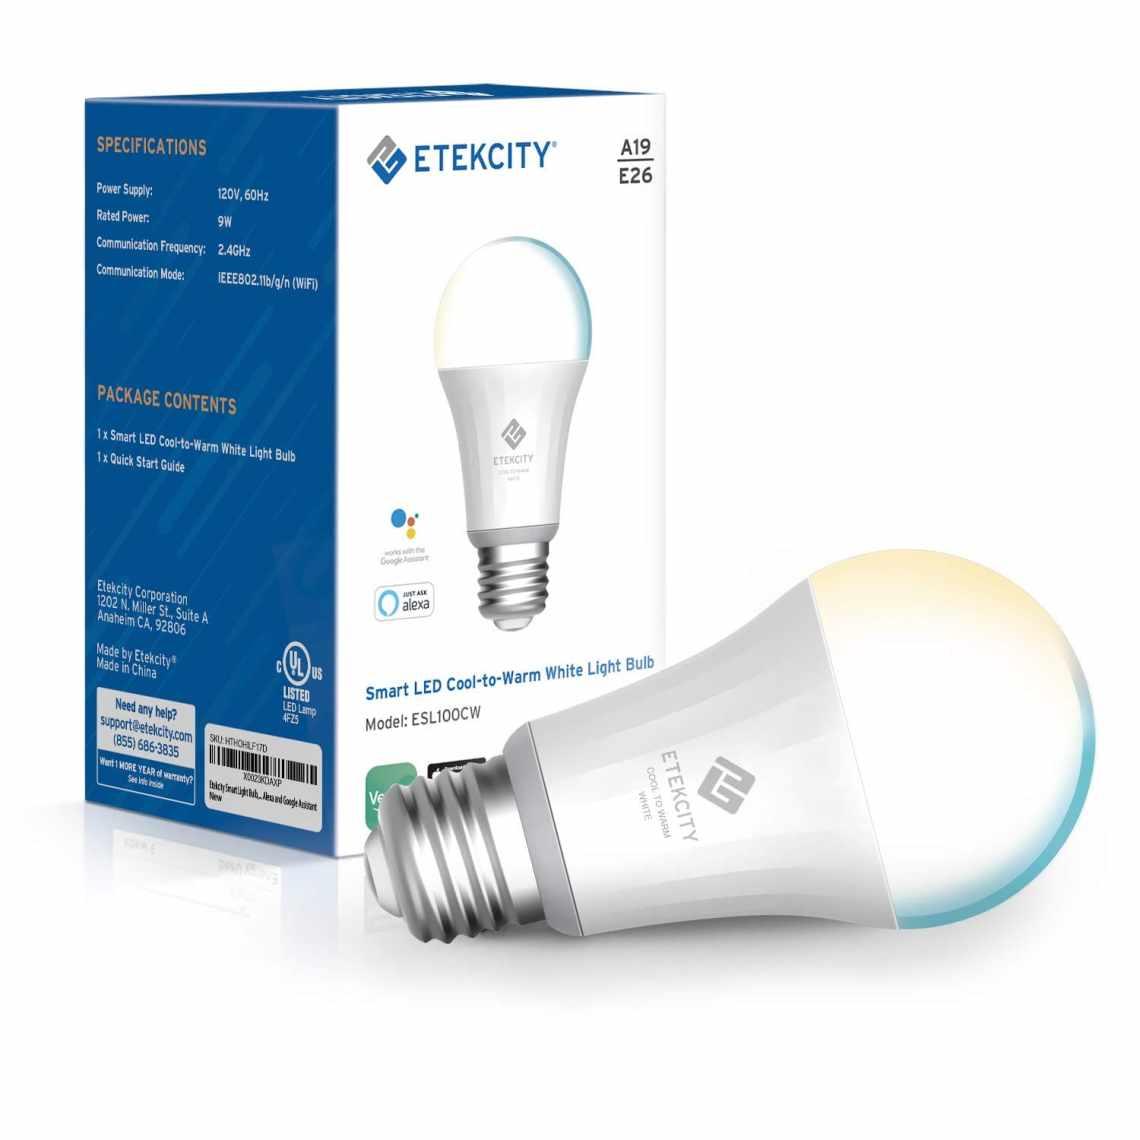 Etekcity Smart Light Bulb